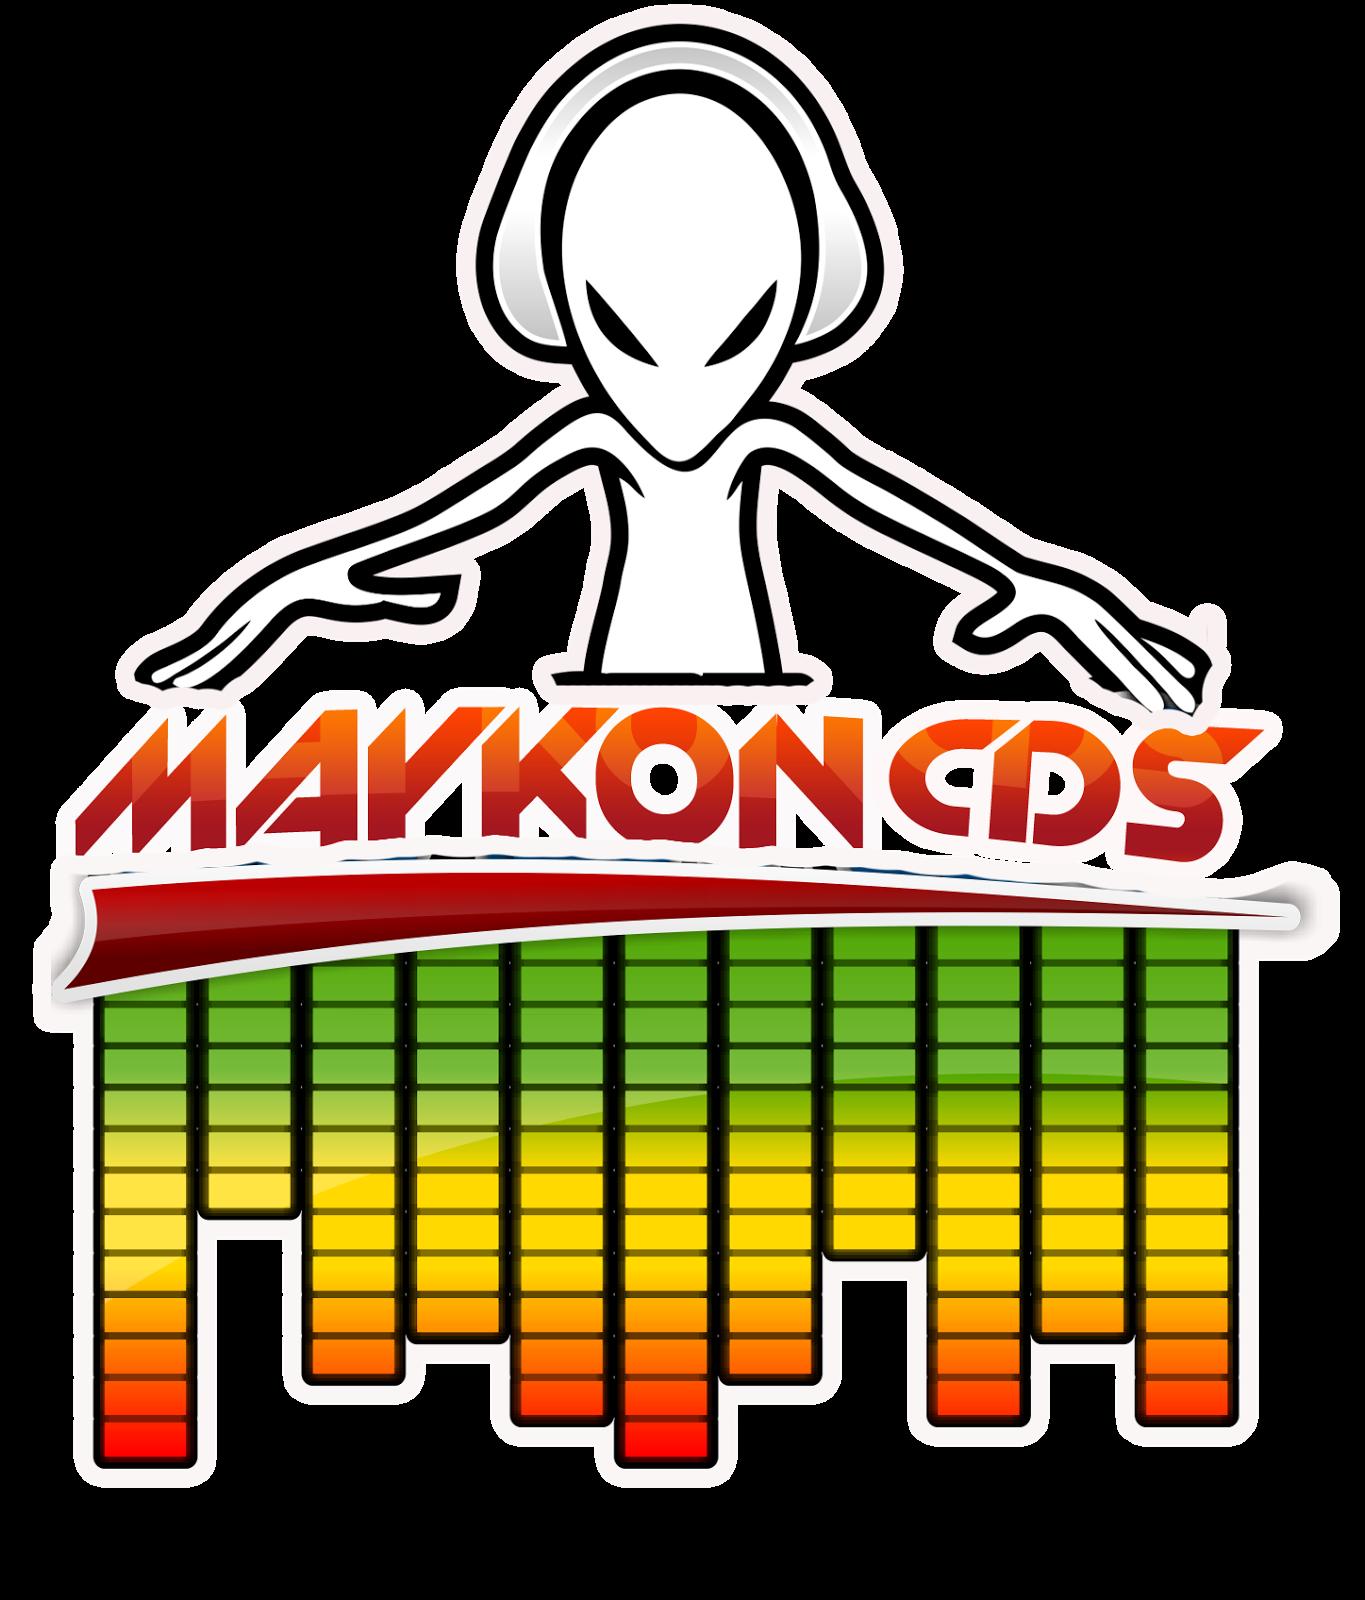 MAYKON CDS TEL. 084 96360165 - COM HUMILDADE CHEGAMOS LONGE.